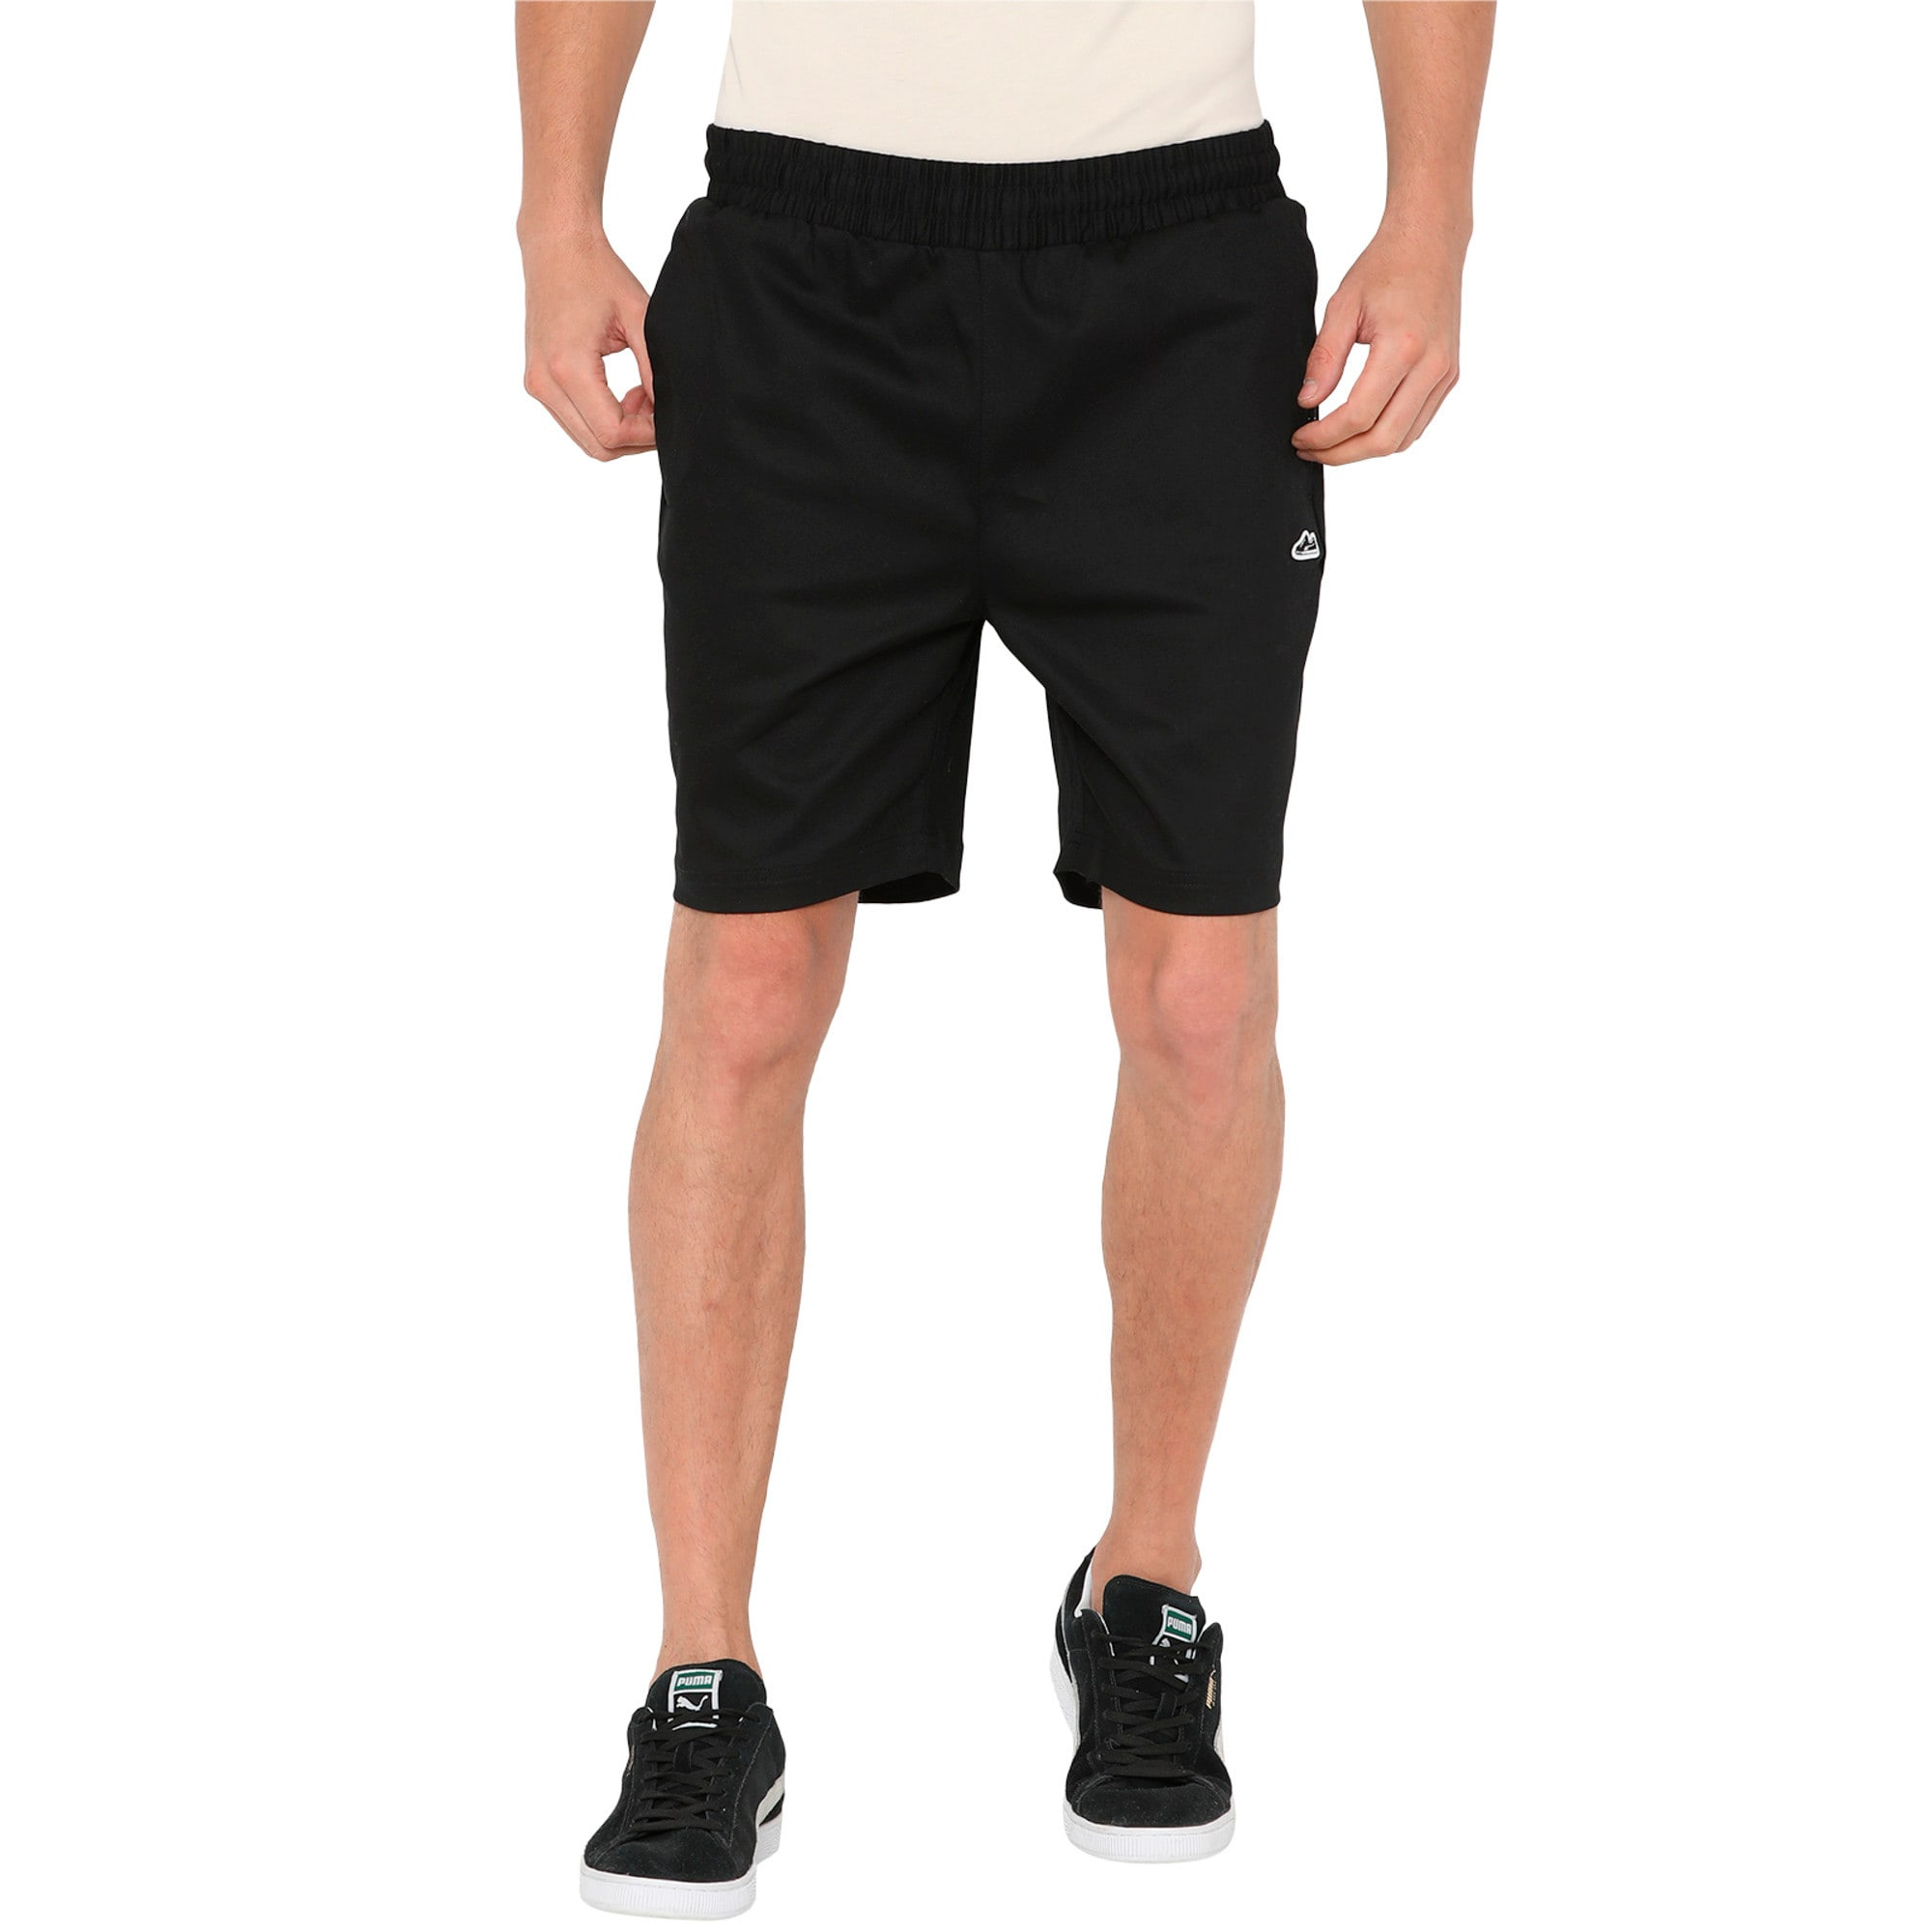 Thumbnail 4 of Men's Suede Shorts, Puma Black, medium-IND